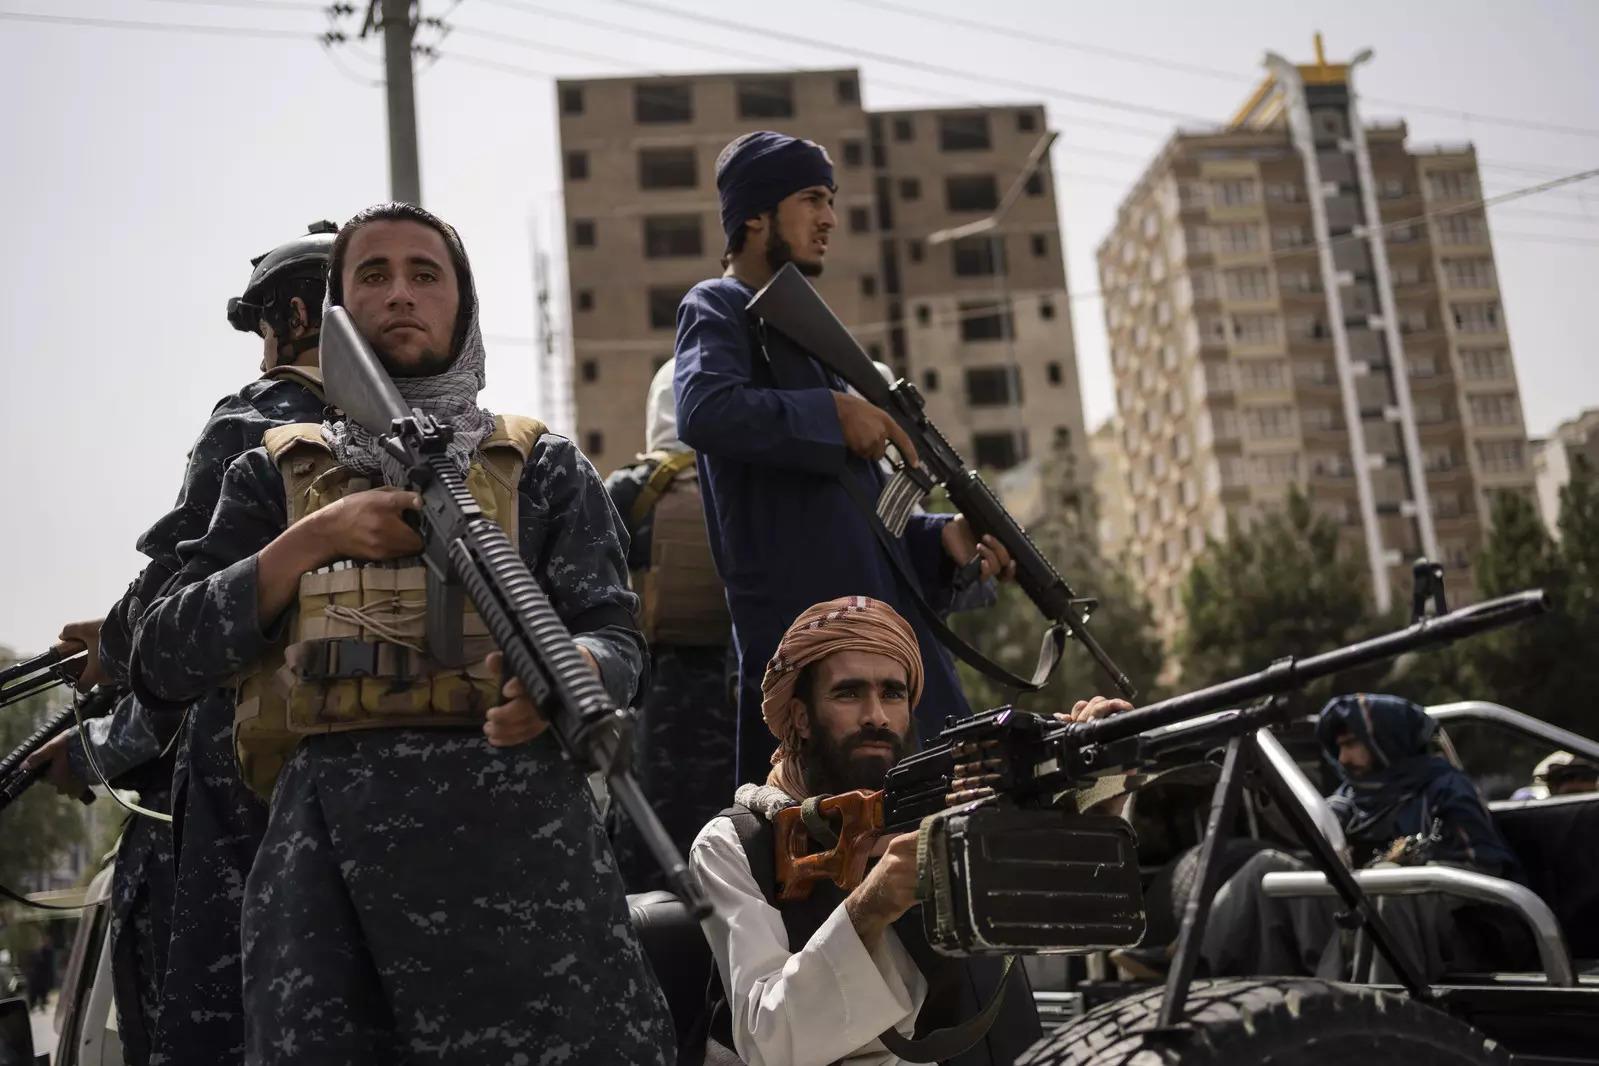 Taliban: US drones must stop entering Afghanistan